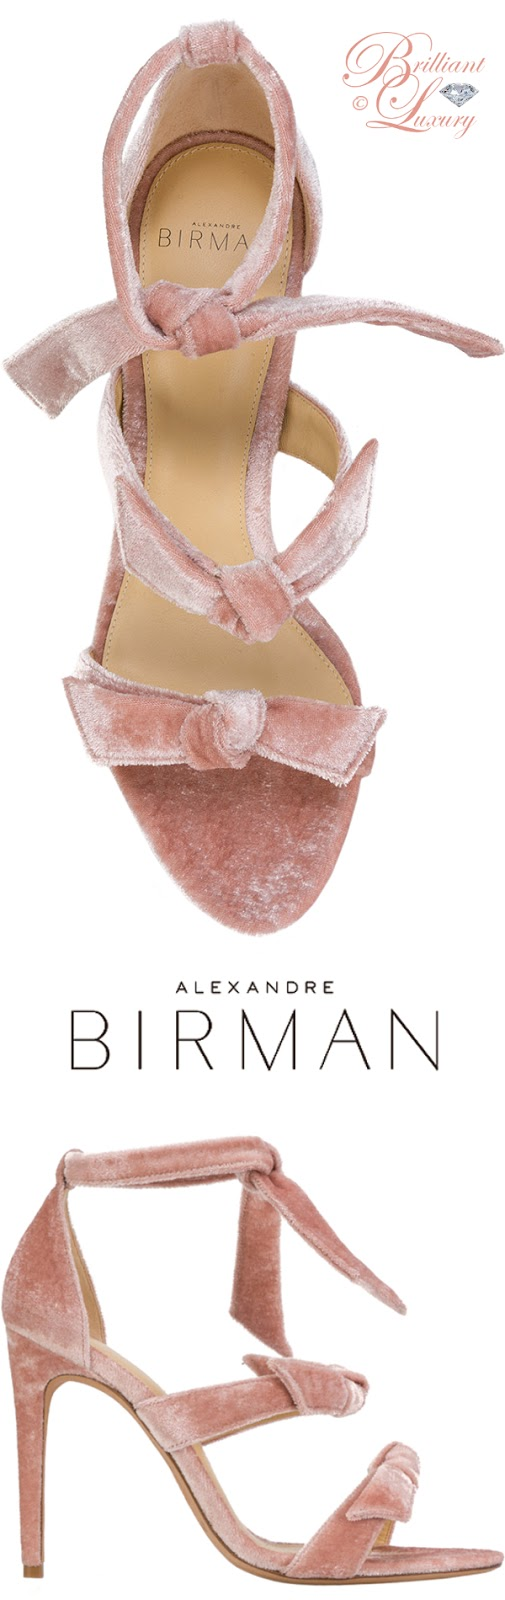 Brilliant Luxury ♦ Alexandre Birman three bow sandals